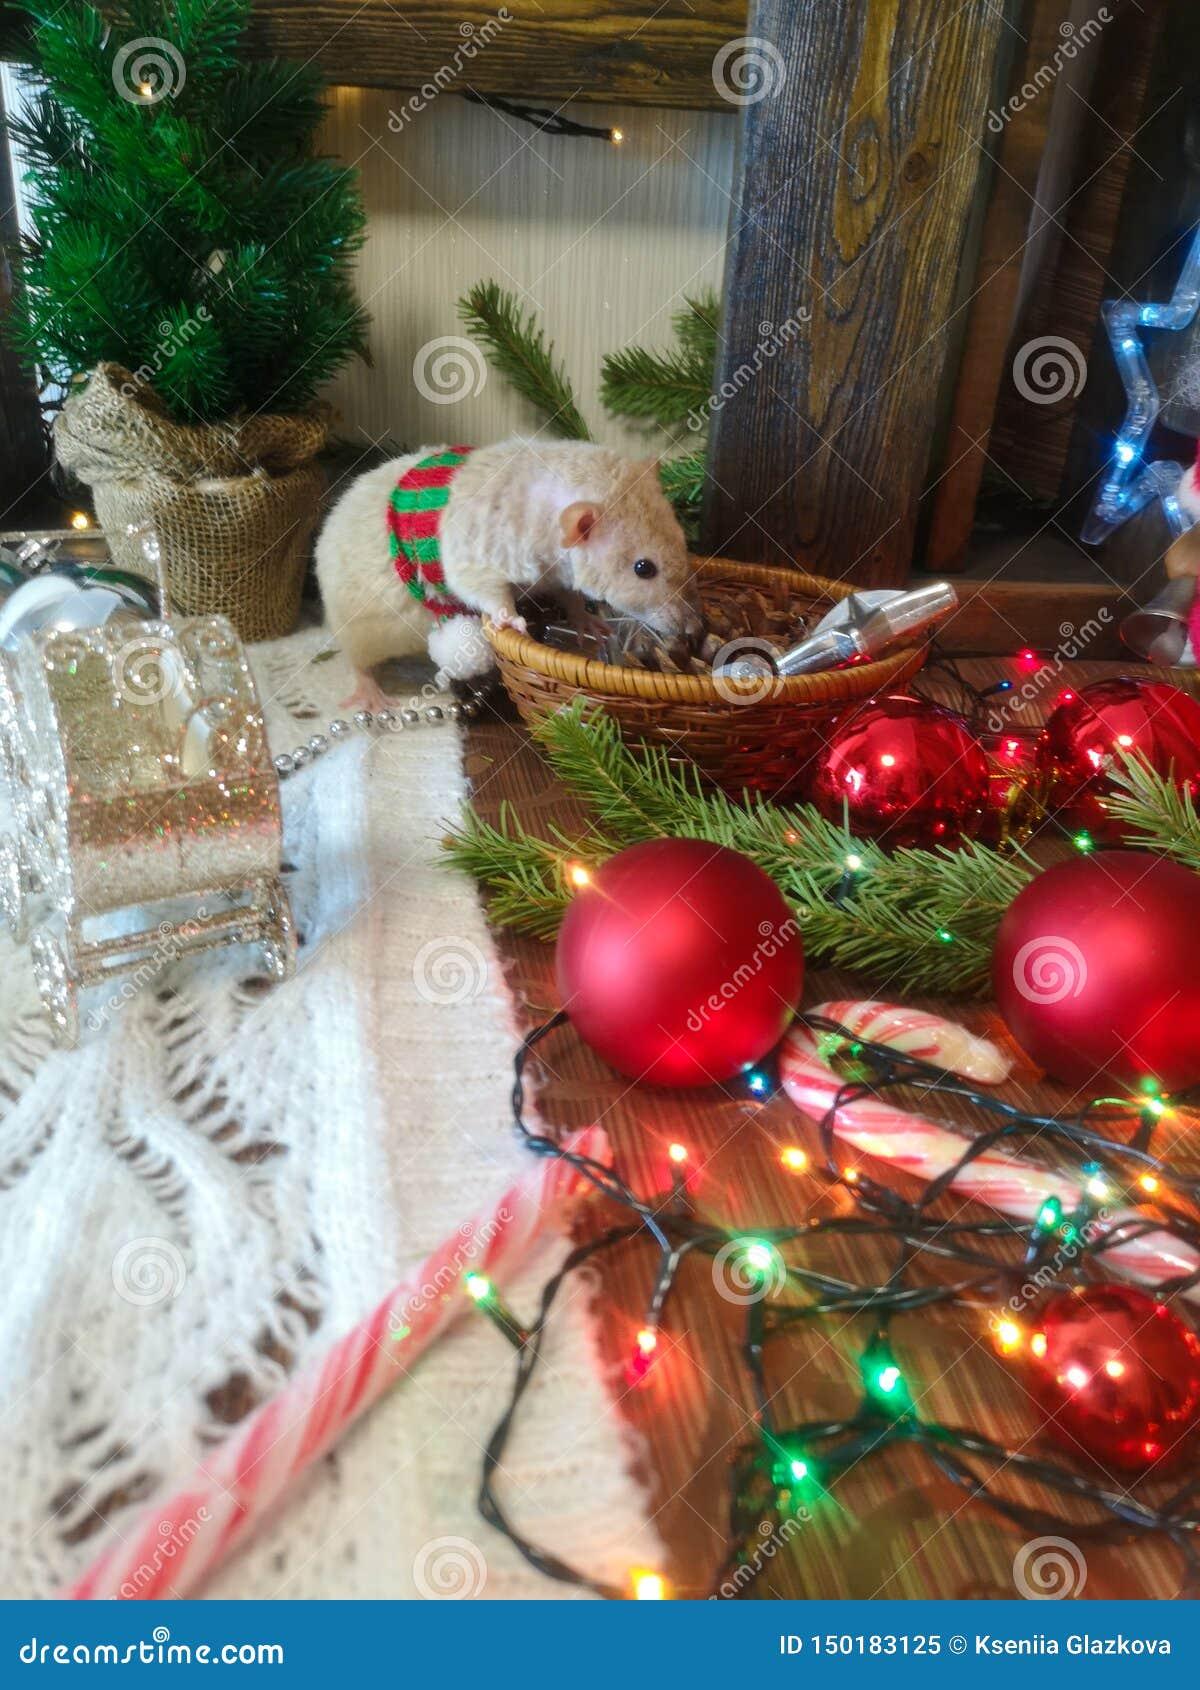 Christmas Animals. Mouse With Christmas Toys. Stock Image